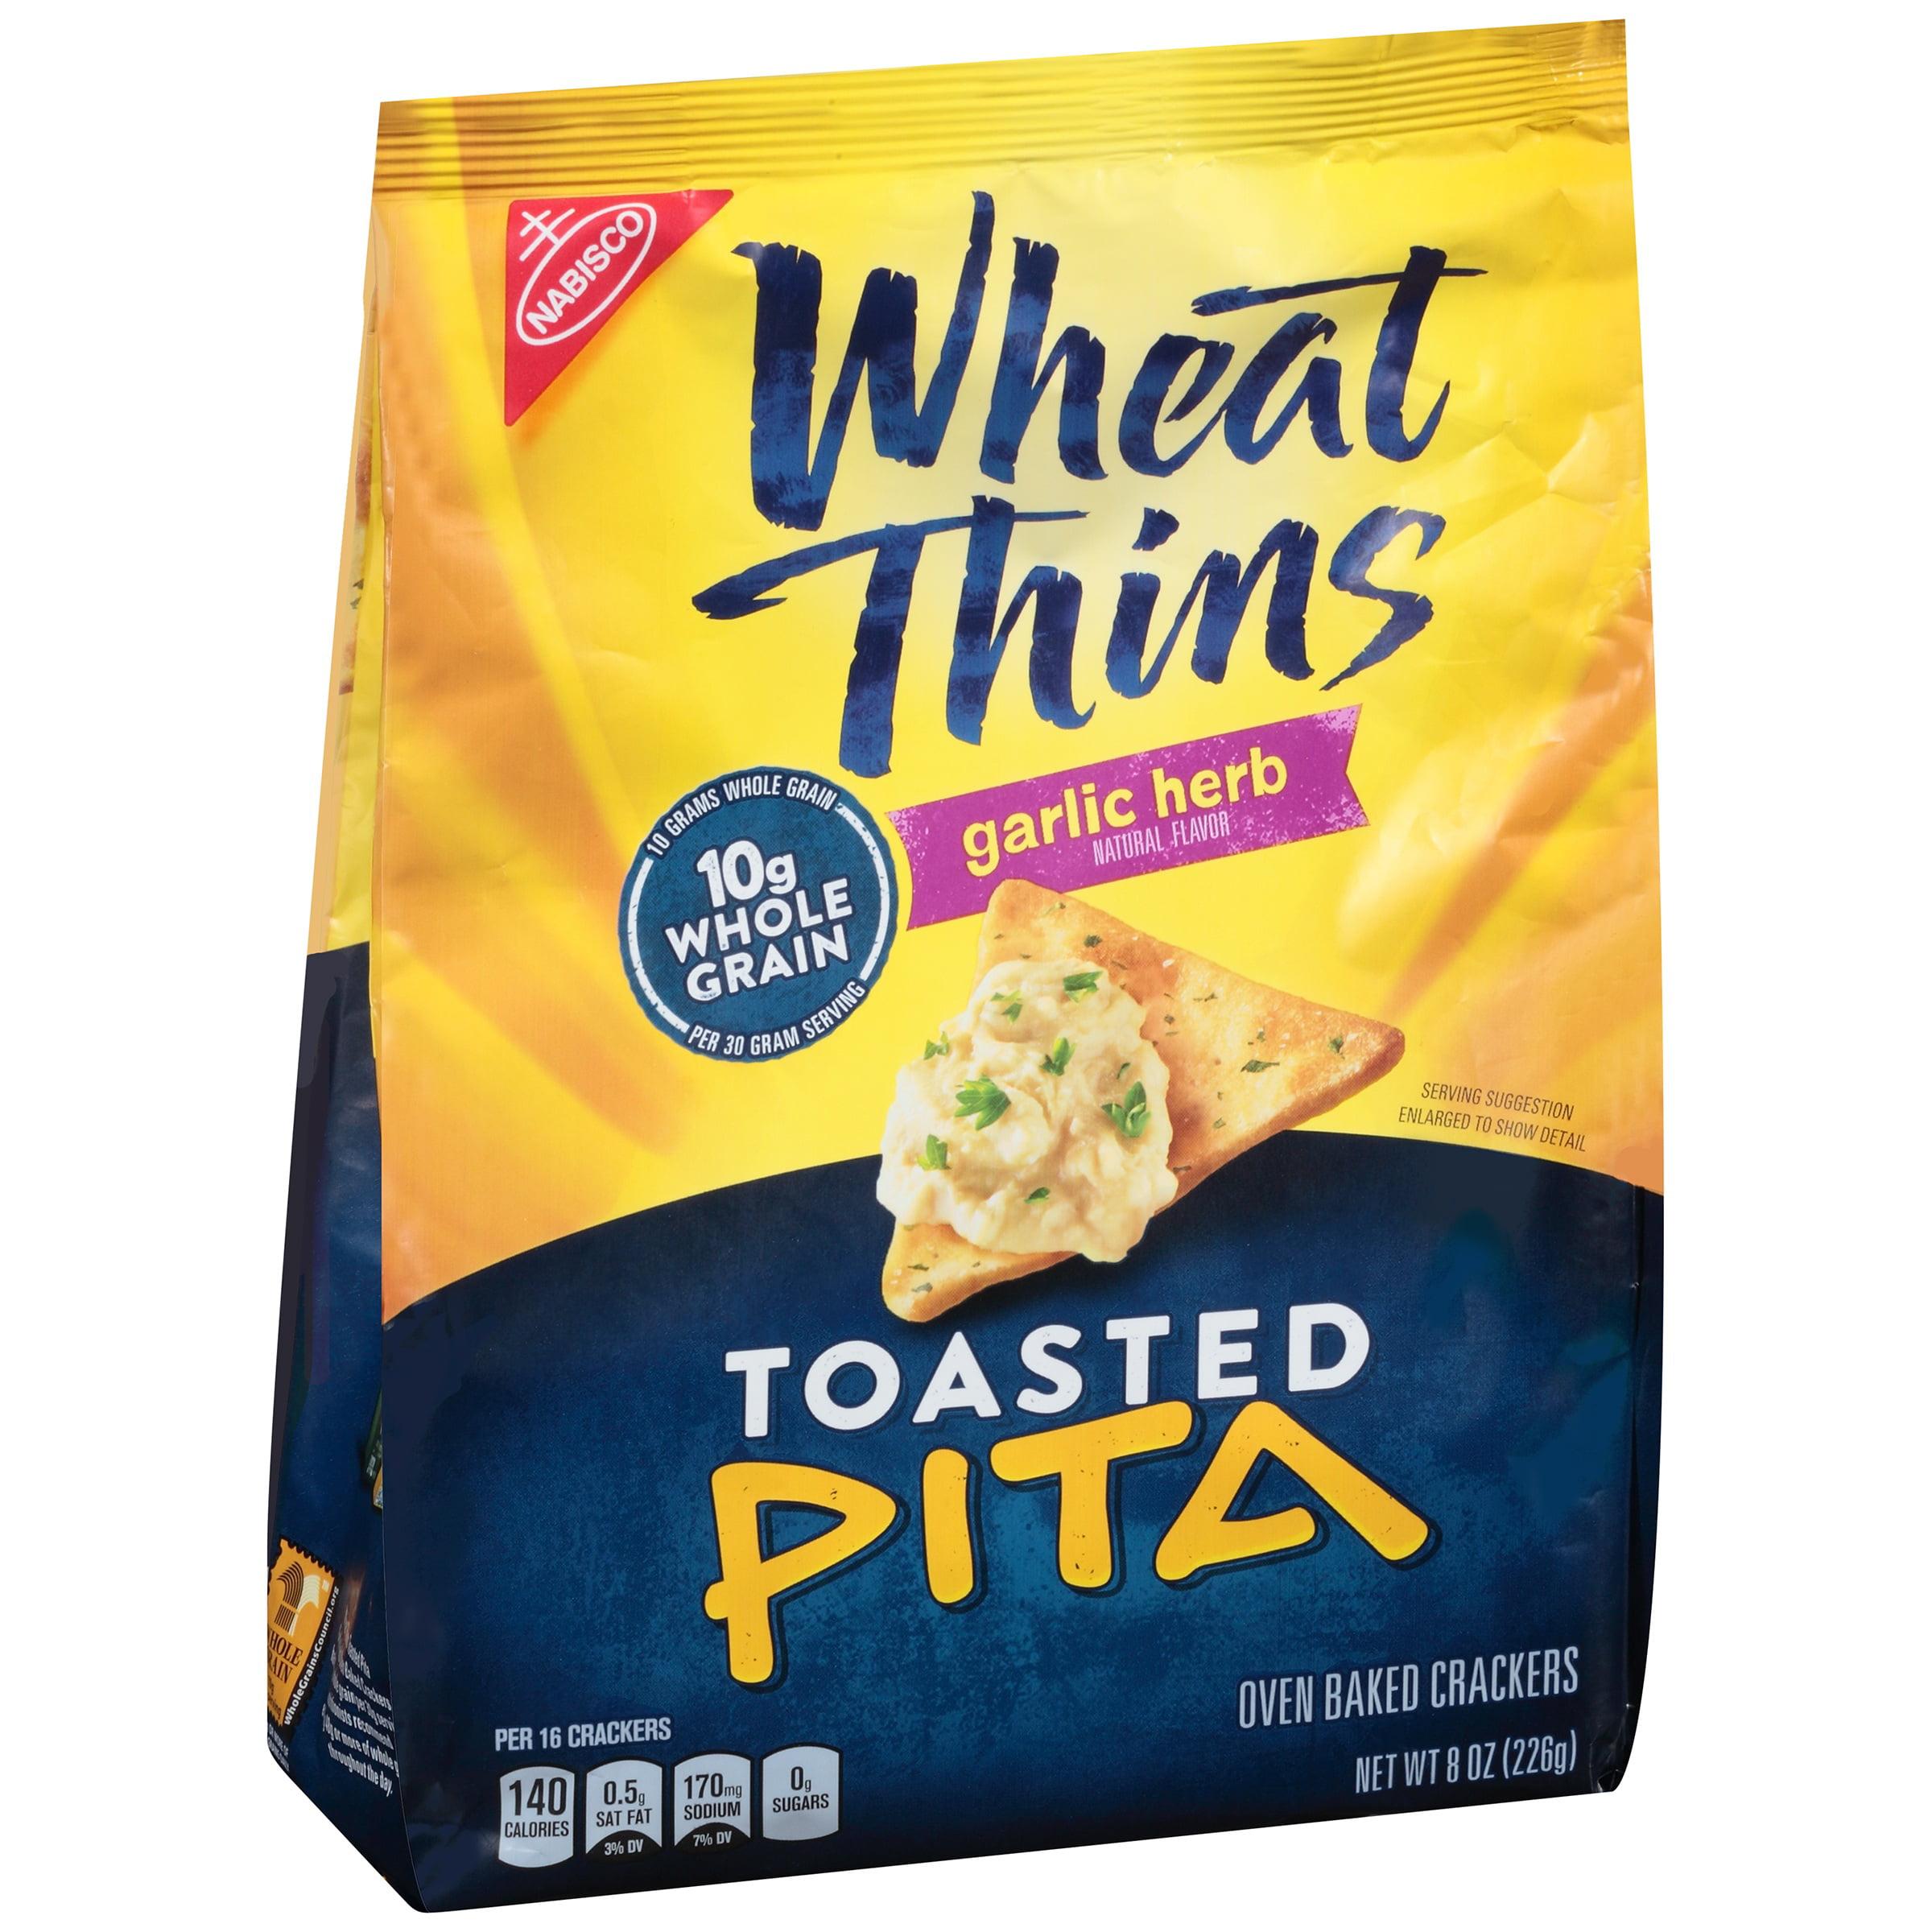 Nabisco Wheat Thins Toasted Pita Garlic Herb Crackers 8 oz. Bag